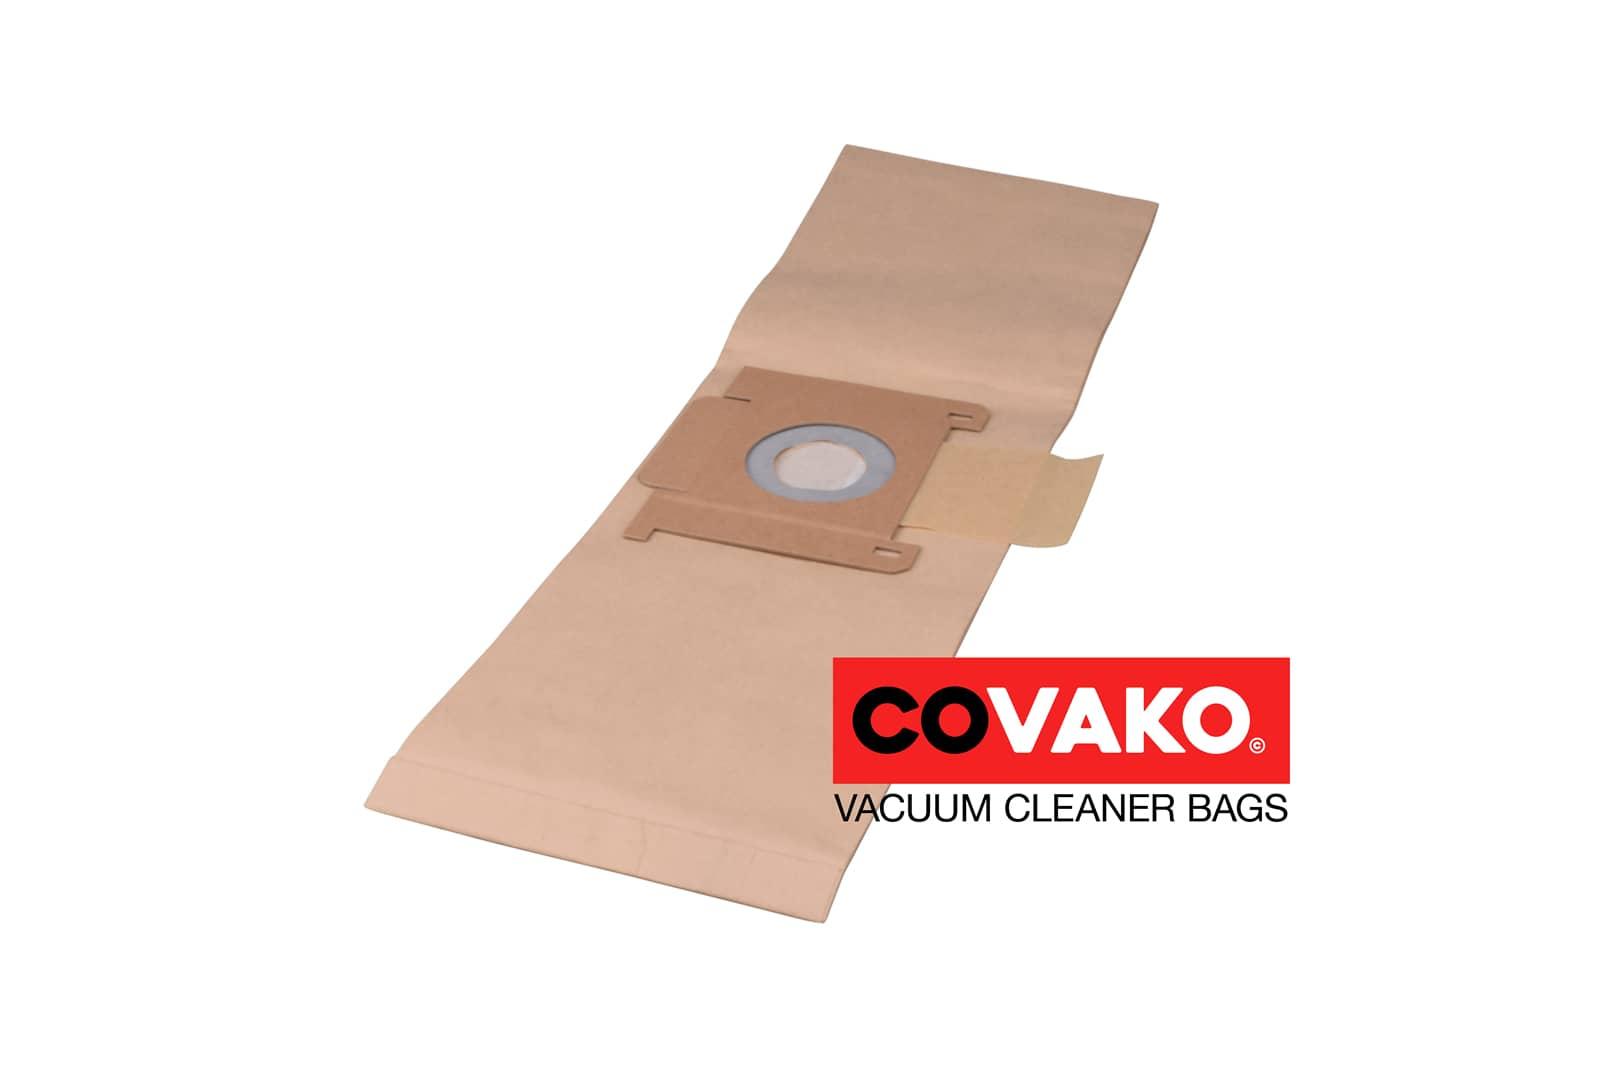 Fast I-vac C5 / Paper - Fast vacuum cleaner bags